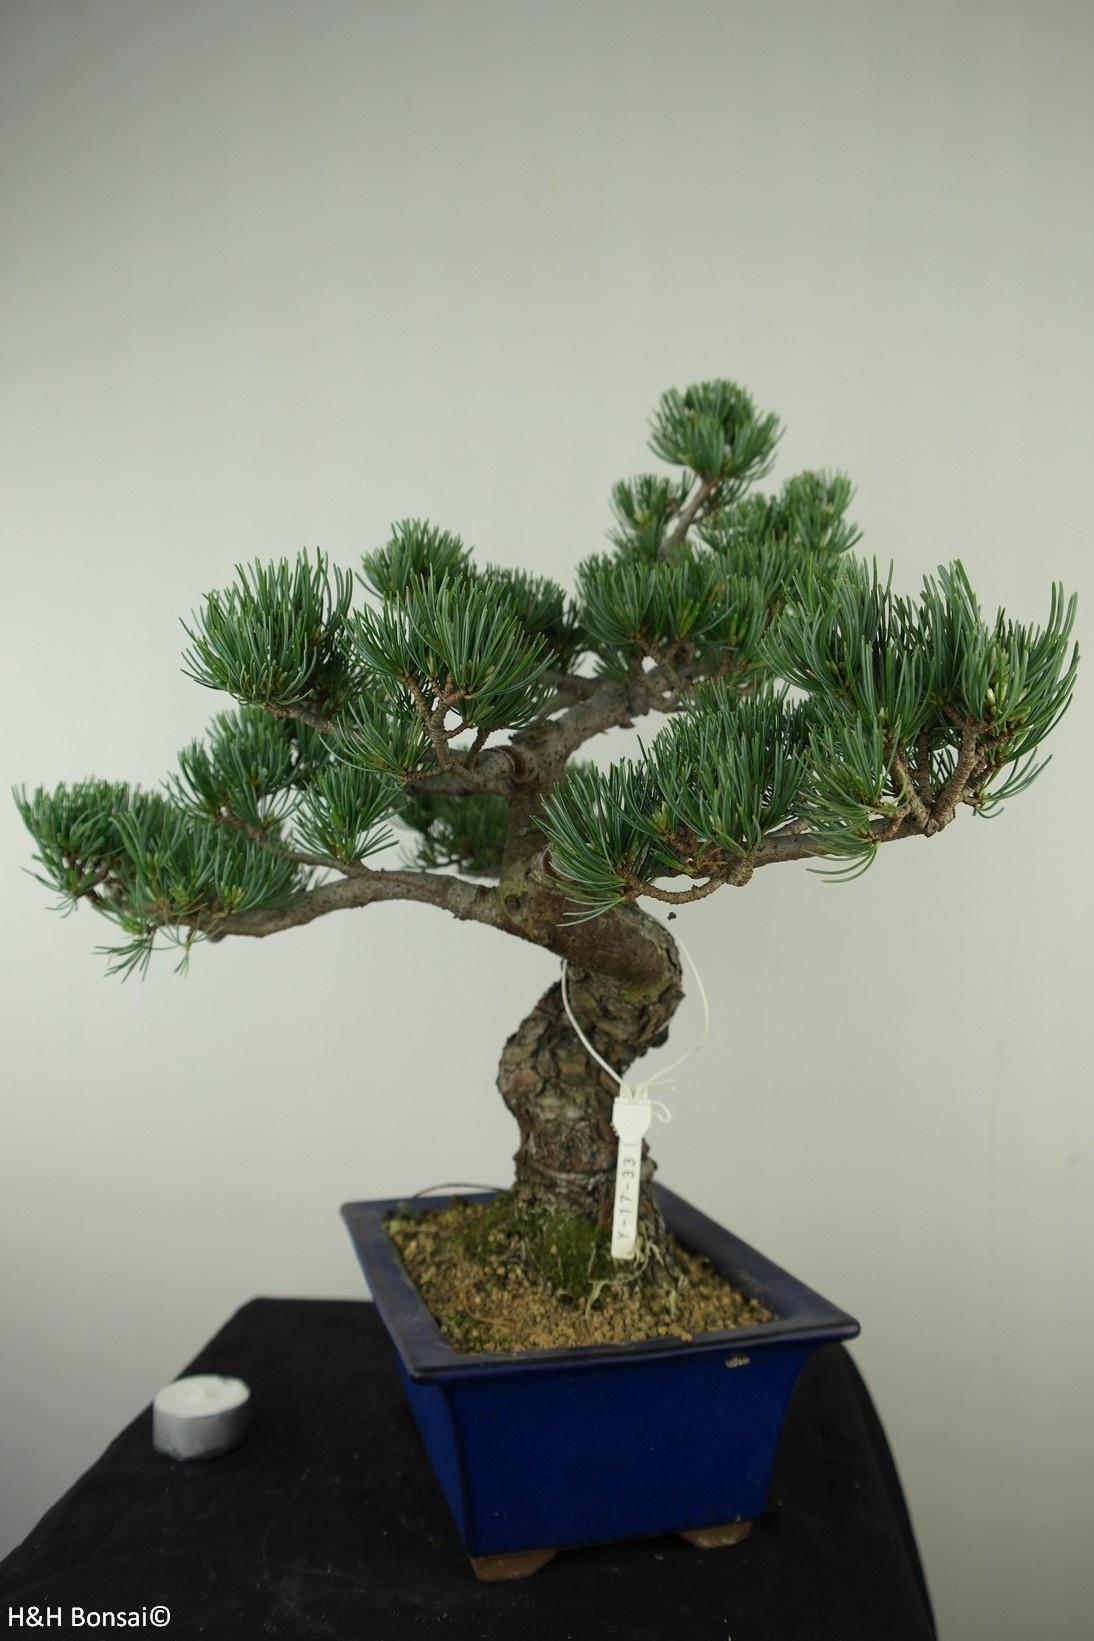 Bonsai Mädchenkiefer, Pinus pentaphylla, nr. 7803